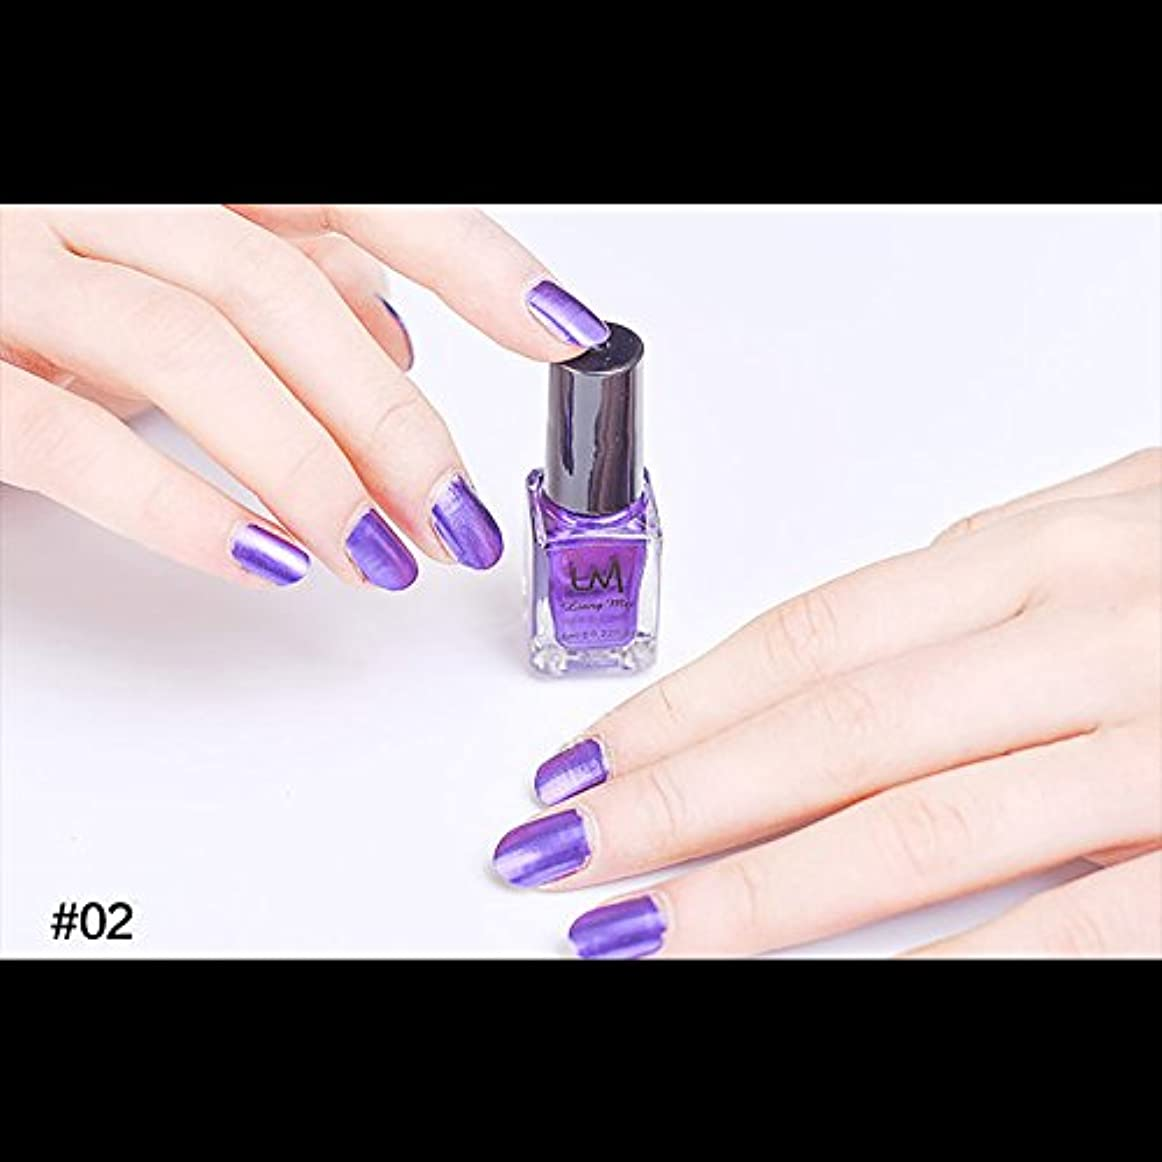 hjuns-Wu マニキュア パール感 1ボトル 6ml 【全12色選択可】 ネイルポリッシュ